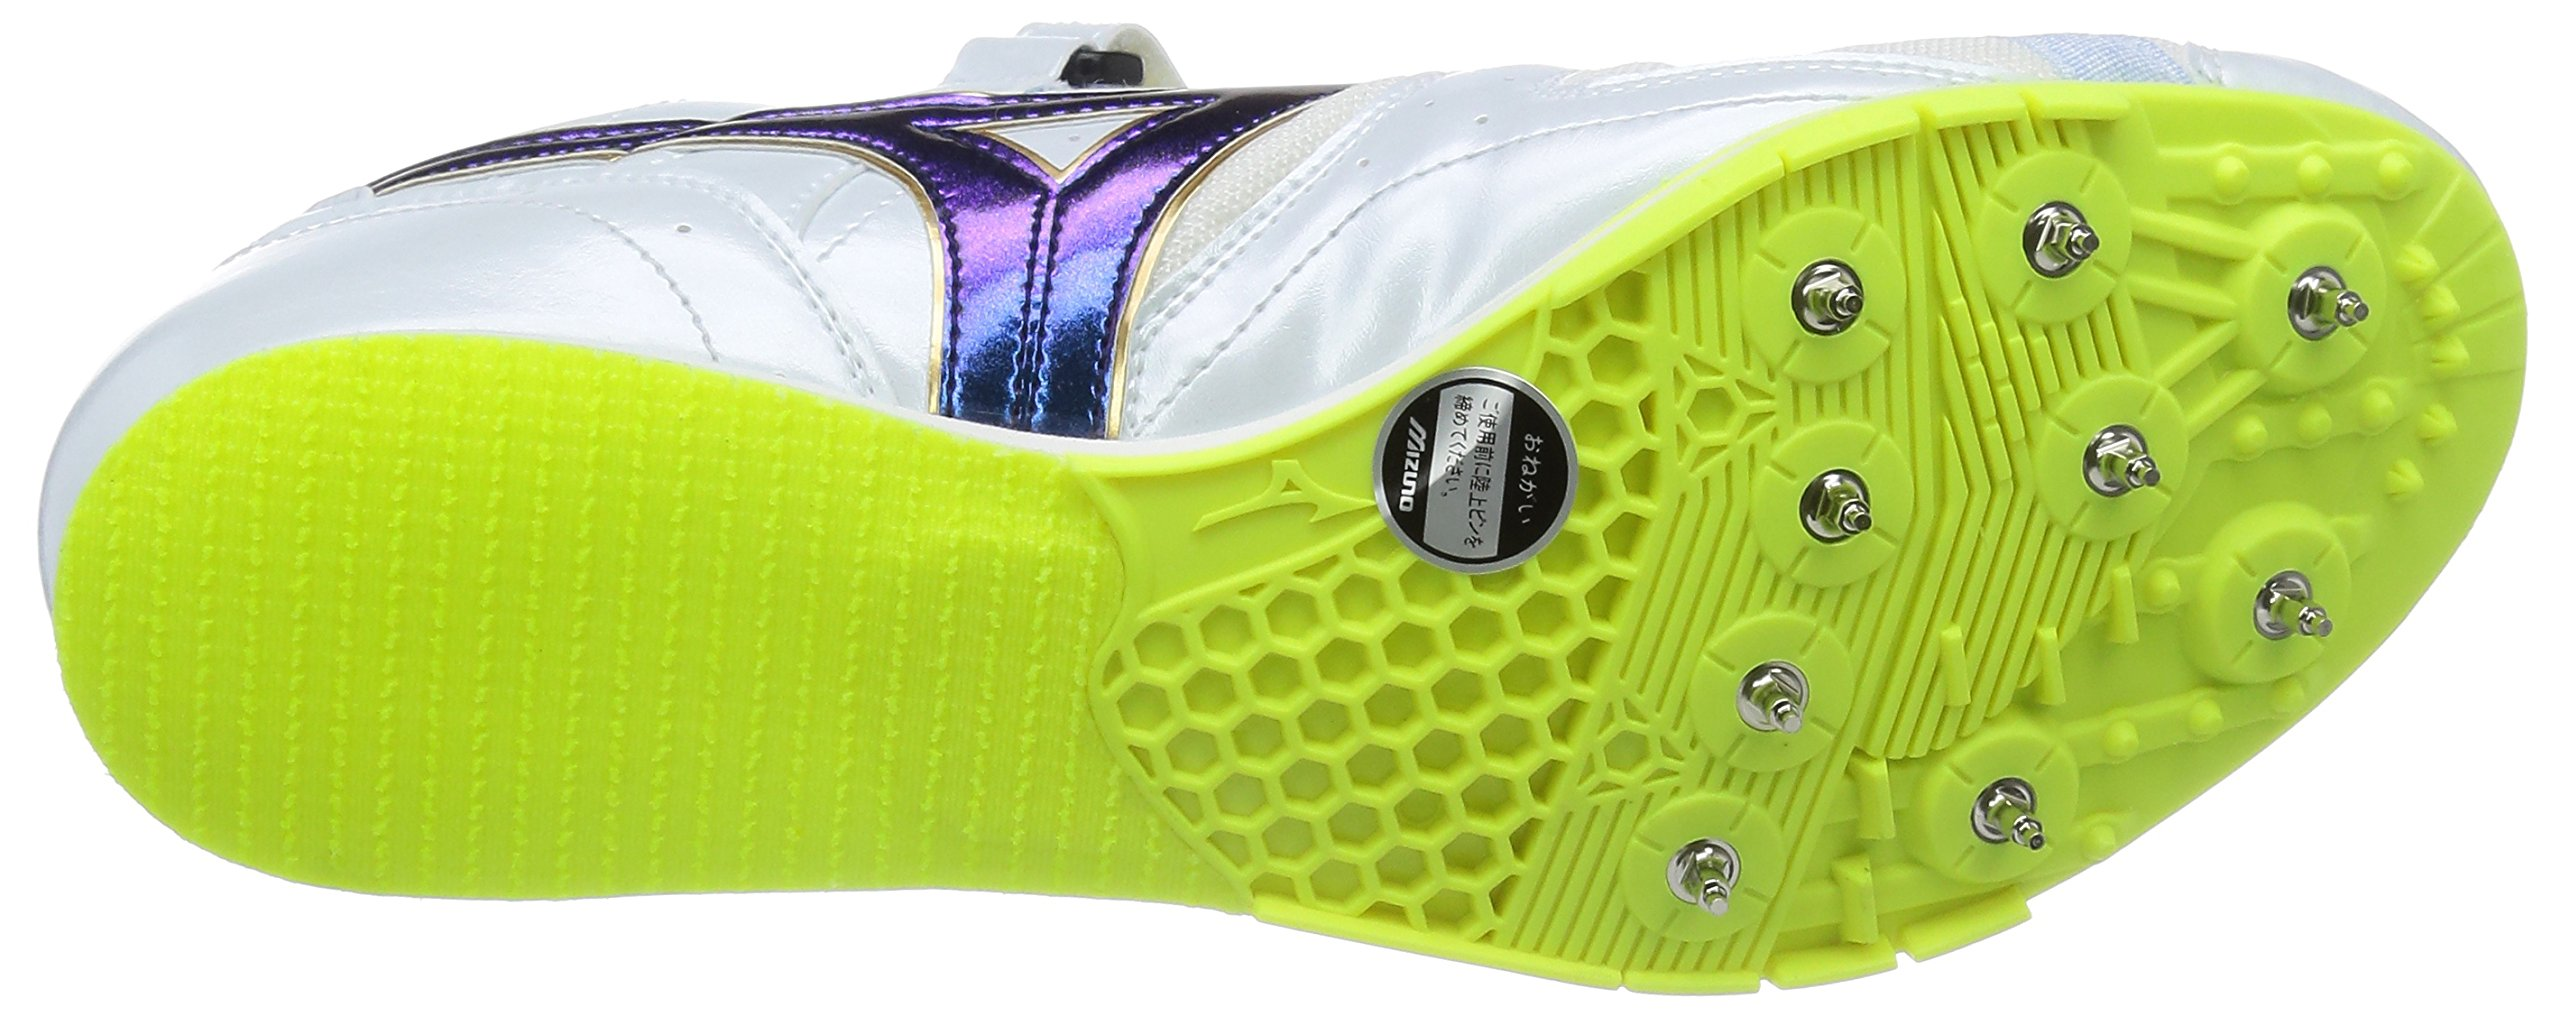 Mizuno Men's Field GEO LJ Track Shoes Yellow US 10.5 by Mizuno (Image #3)